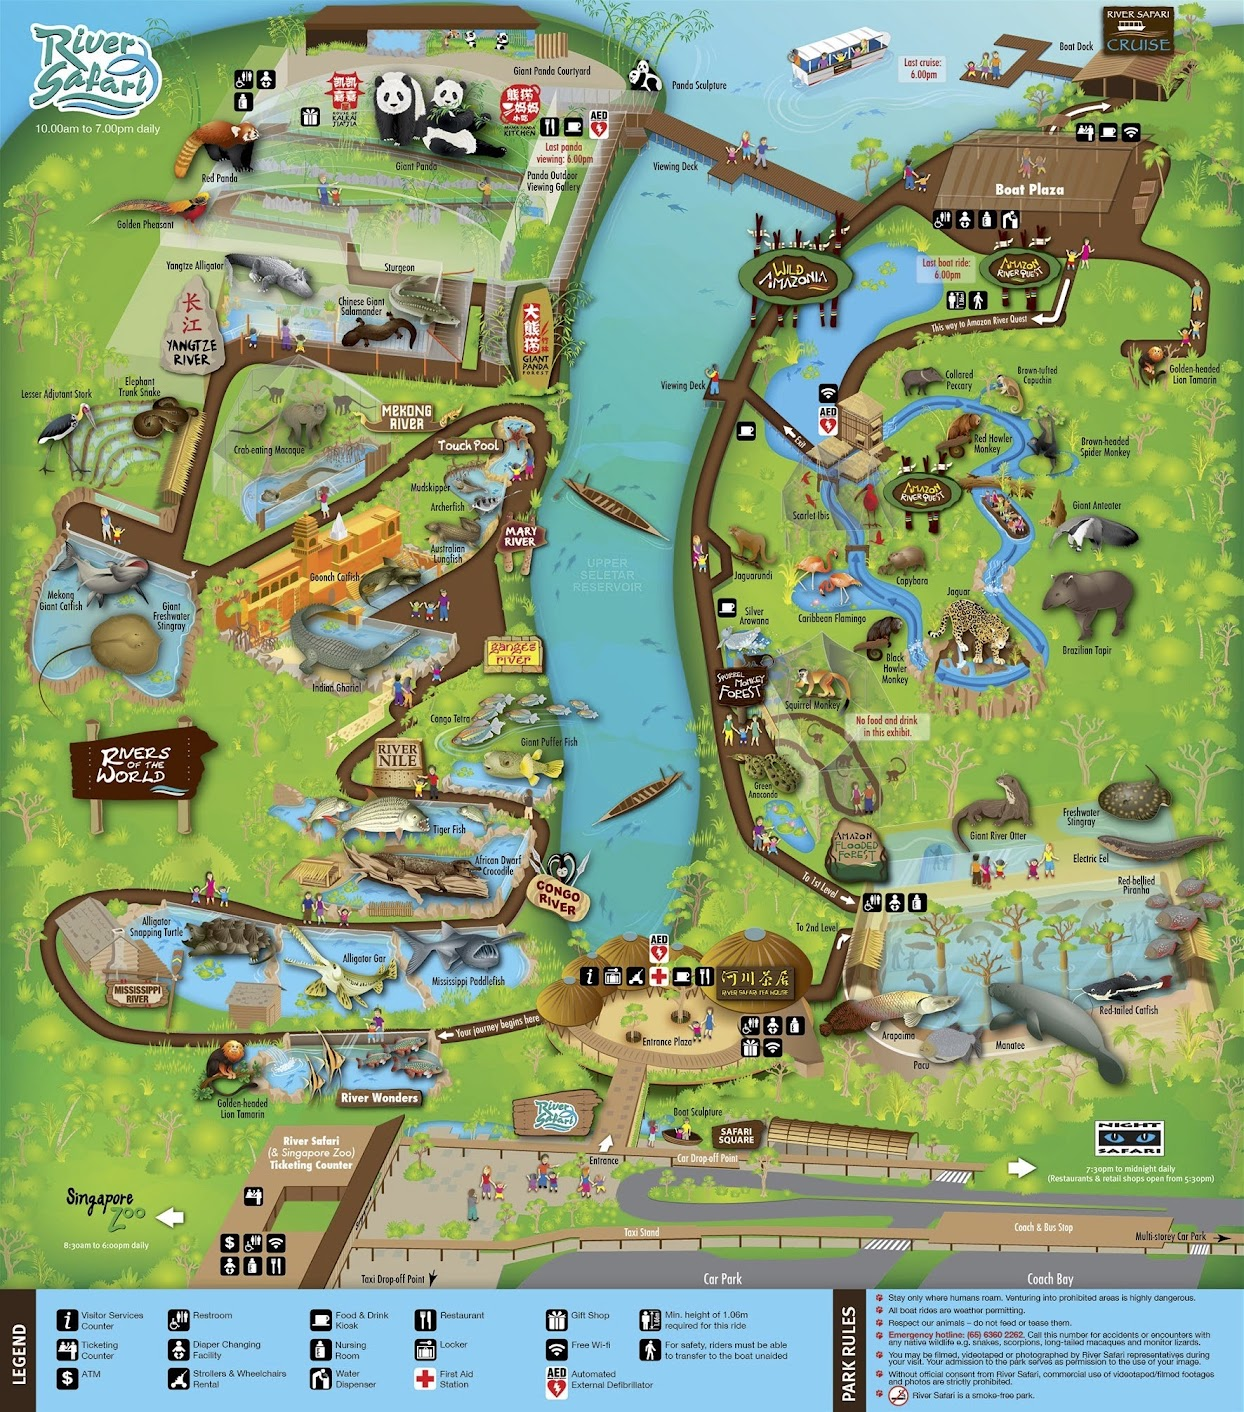 Singapore River Safari map